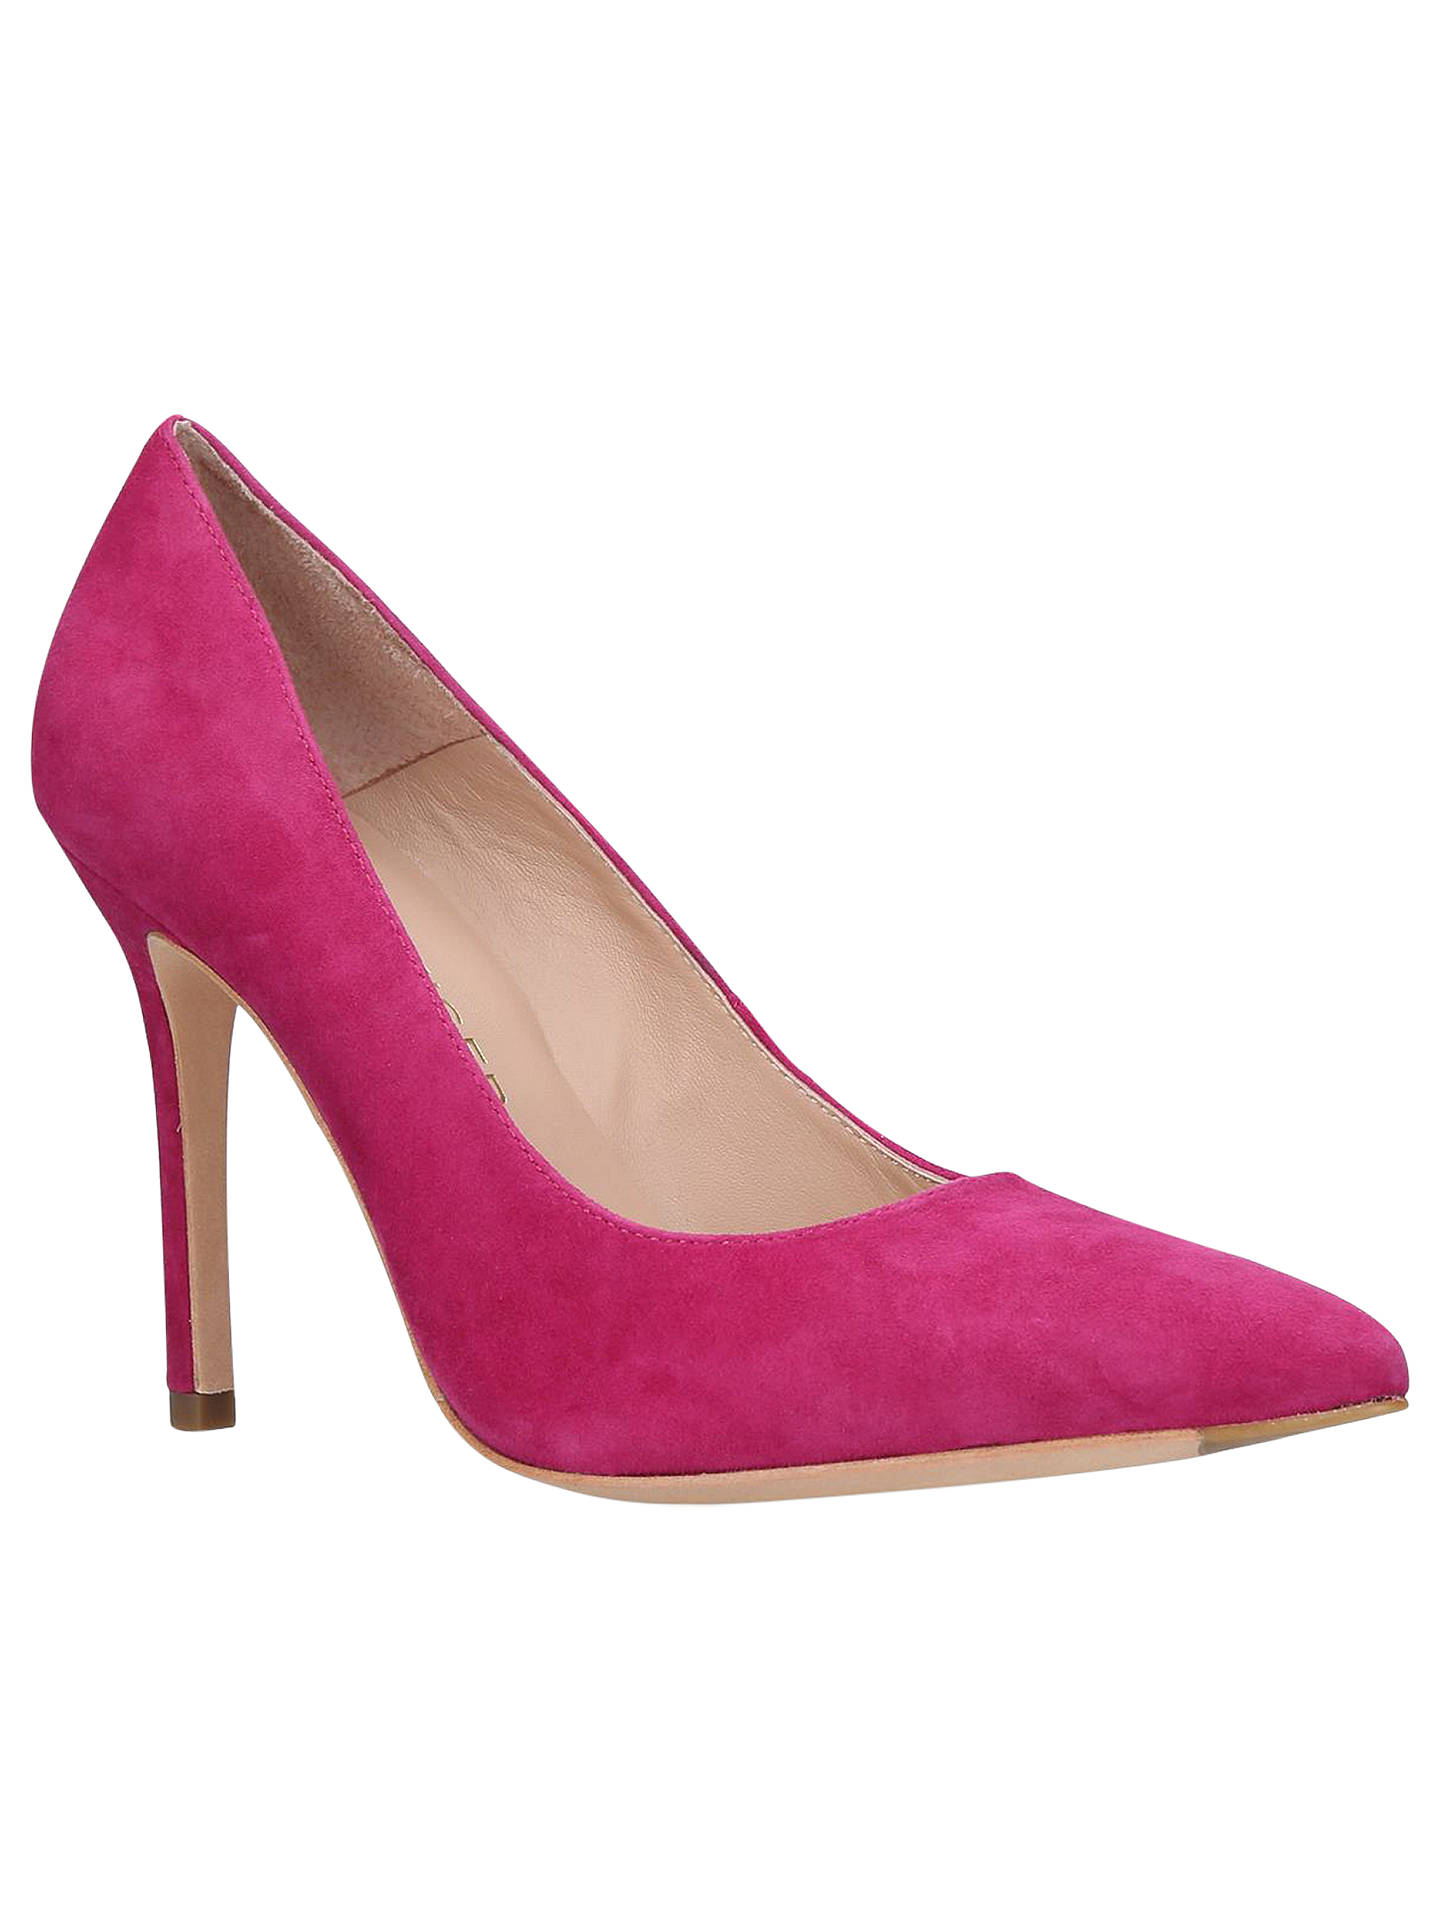 3ba4a7a48aa Kurt Geiger London Brompton High Heel Court Shoes, Pink Suede at ...